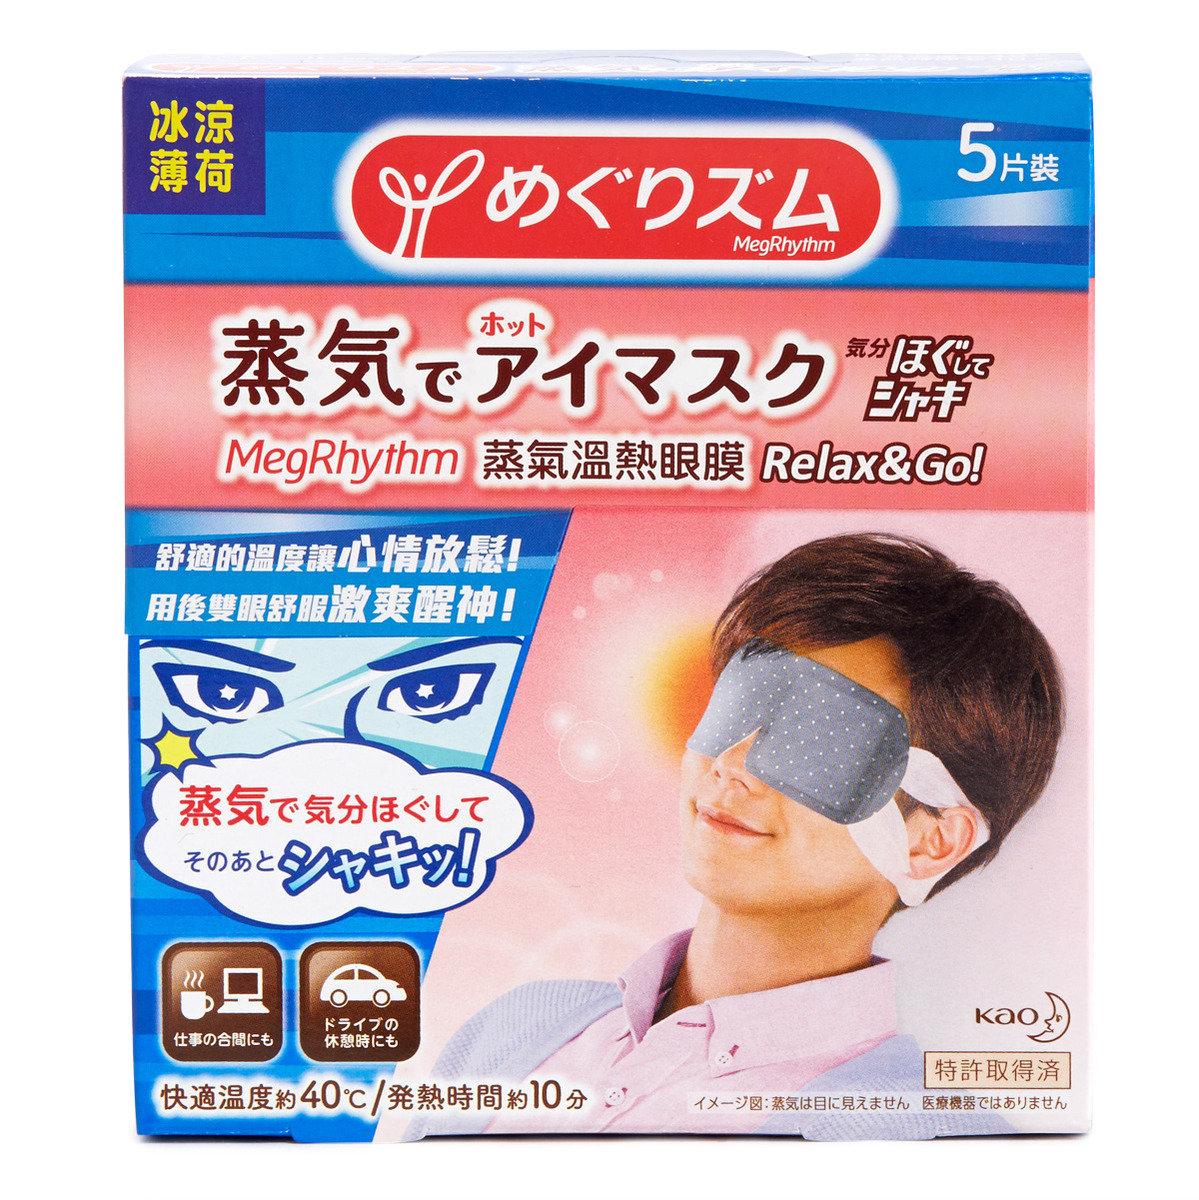 MegRhythm - 蒸氣溫熱眼膜Relax&Go (5片)